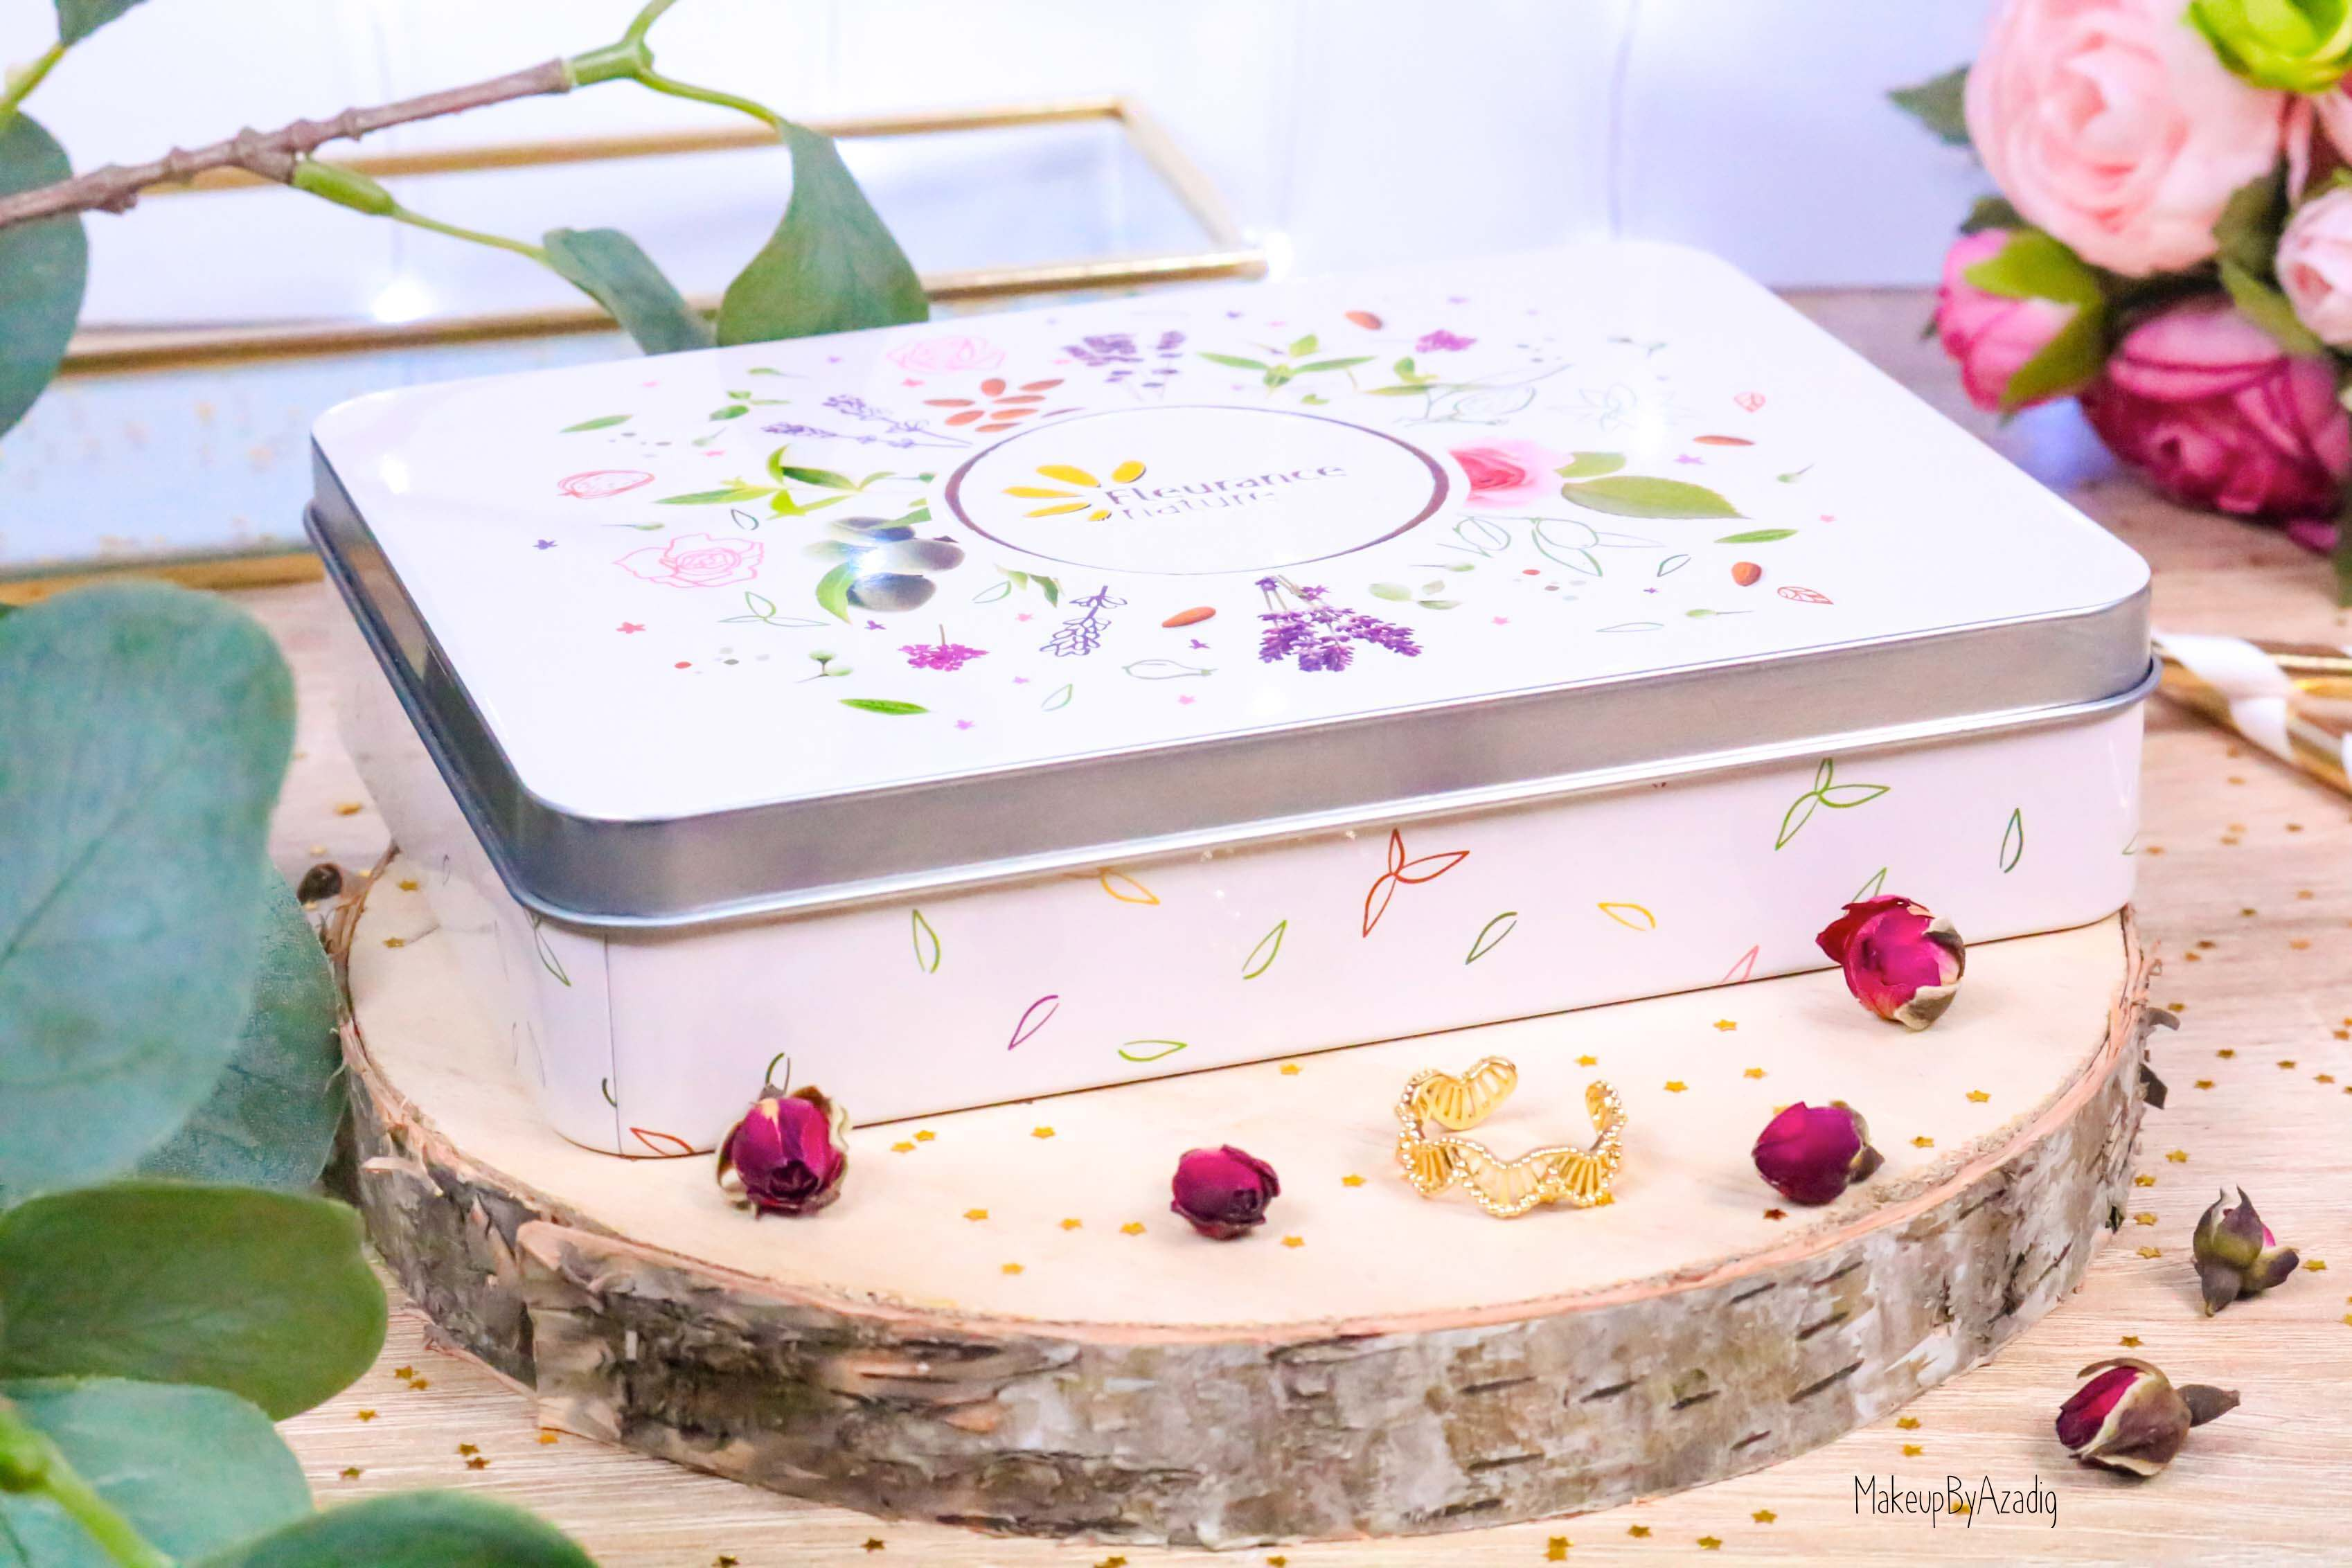 revue-creme-hydratante-reparatrice-mains-hand-bio-beaute-fleurance-nature-makeupbyazadig-verveine-lavande-rose-amande-boite